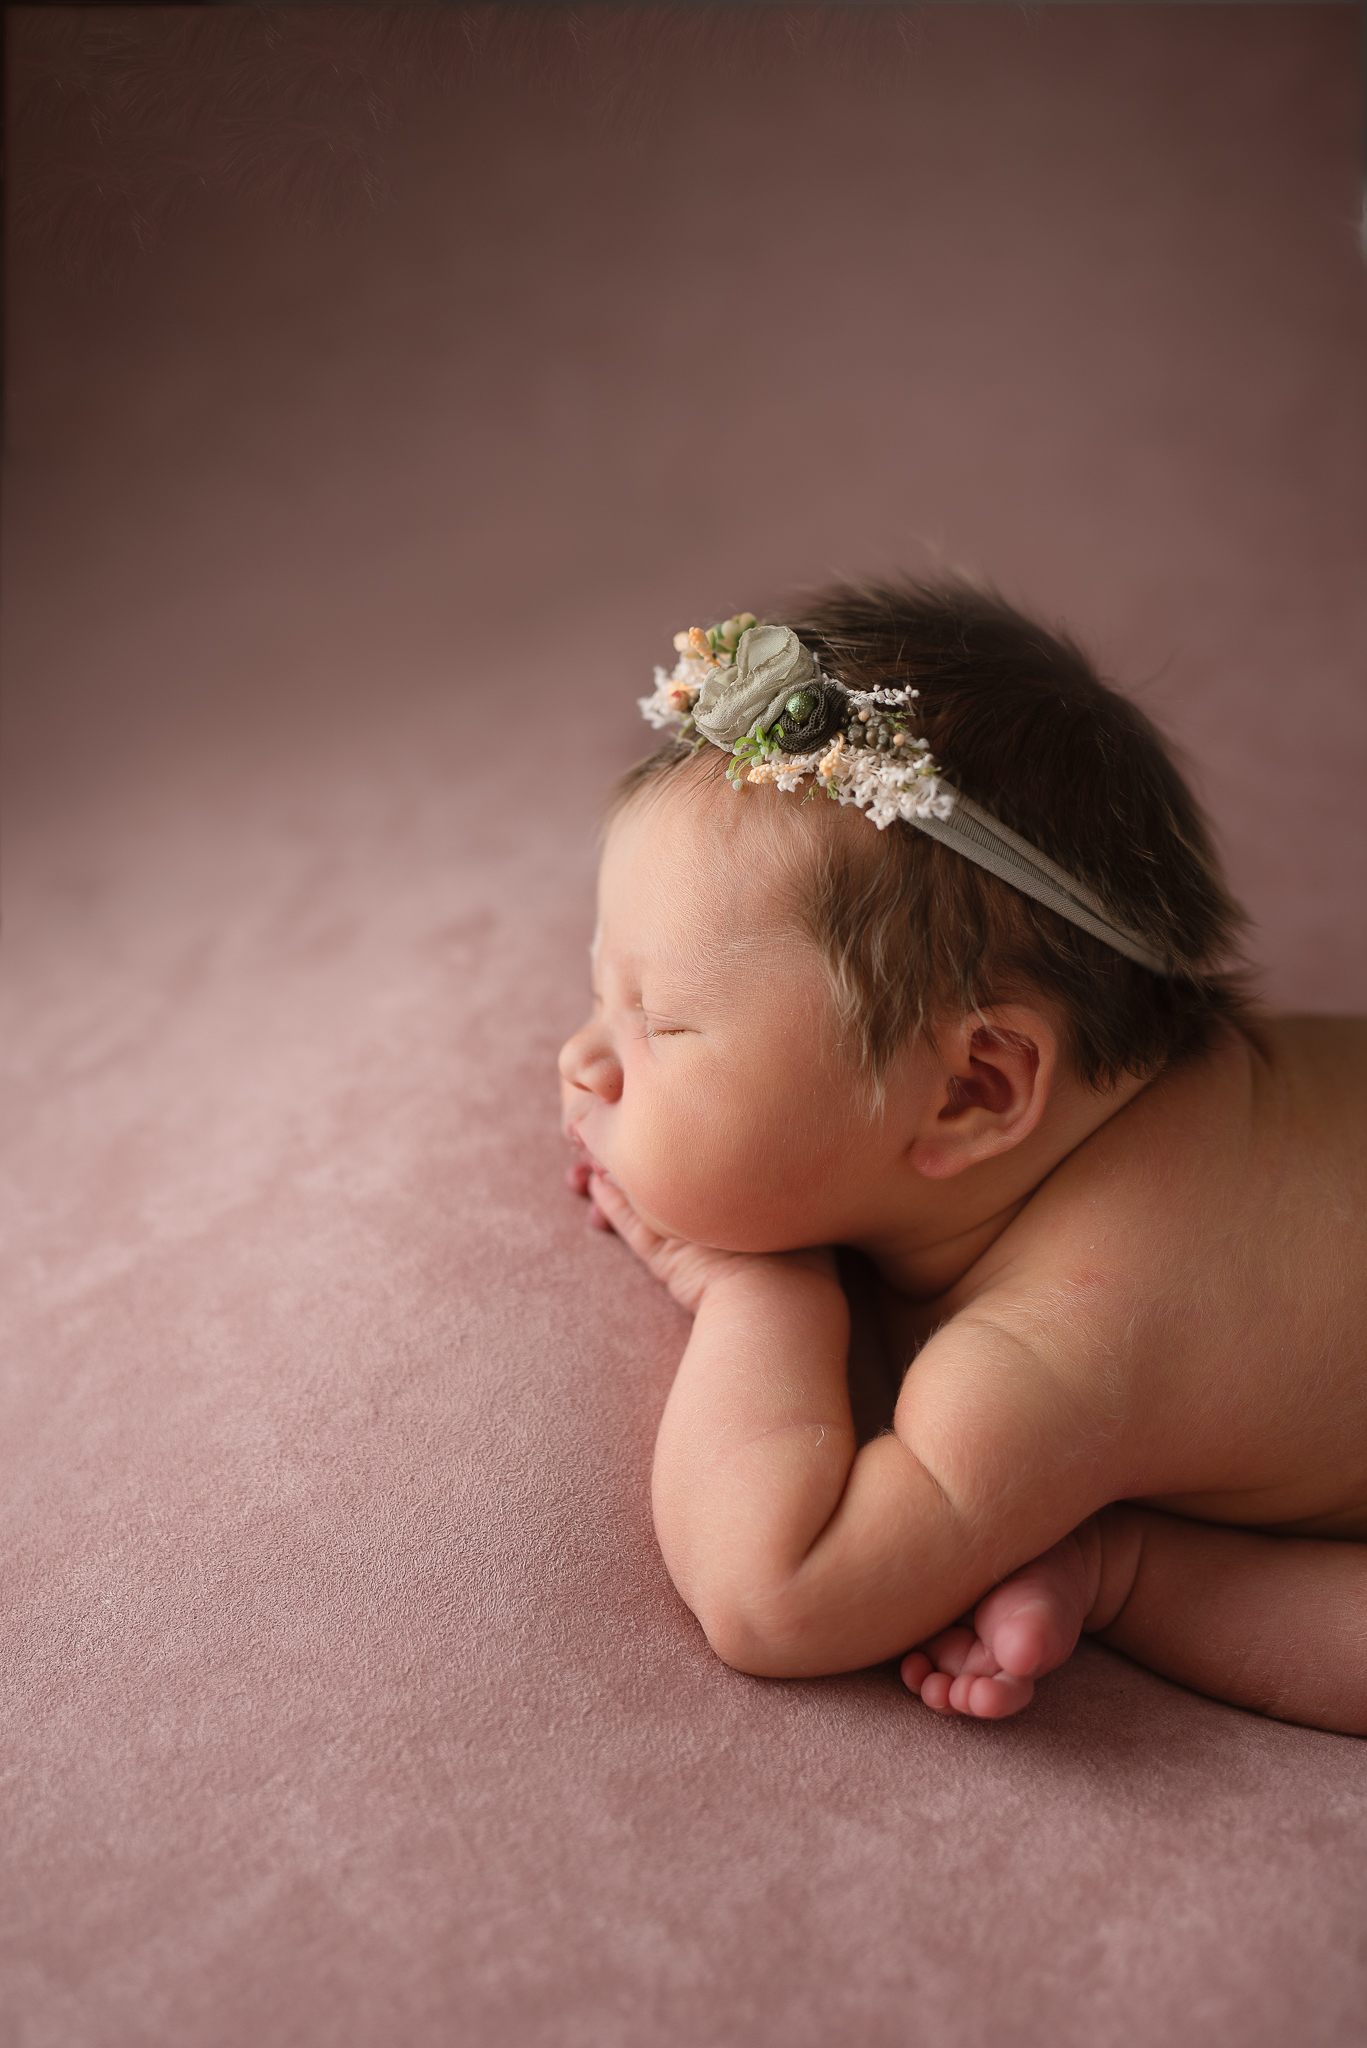 Newborn450NaomiLuciennePhotography062019-Edit.jpg